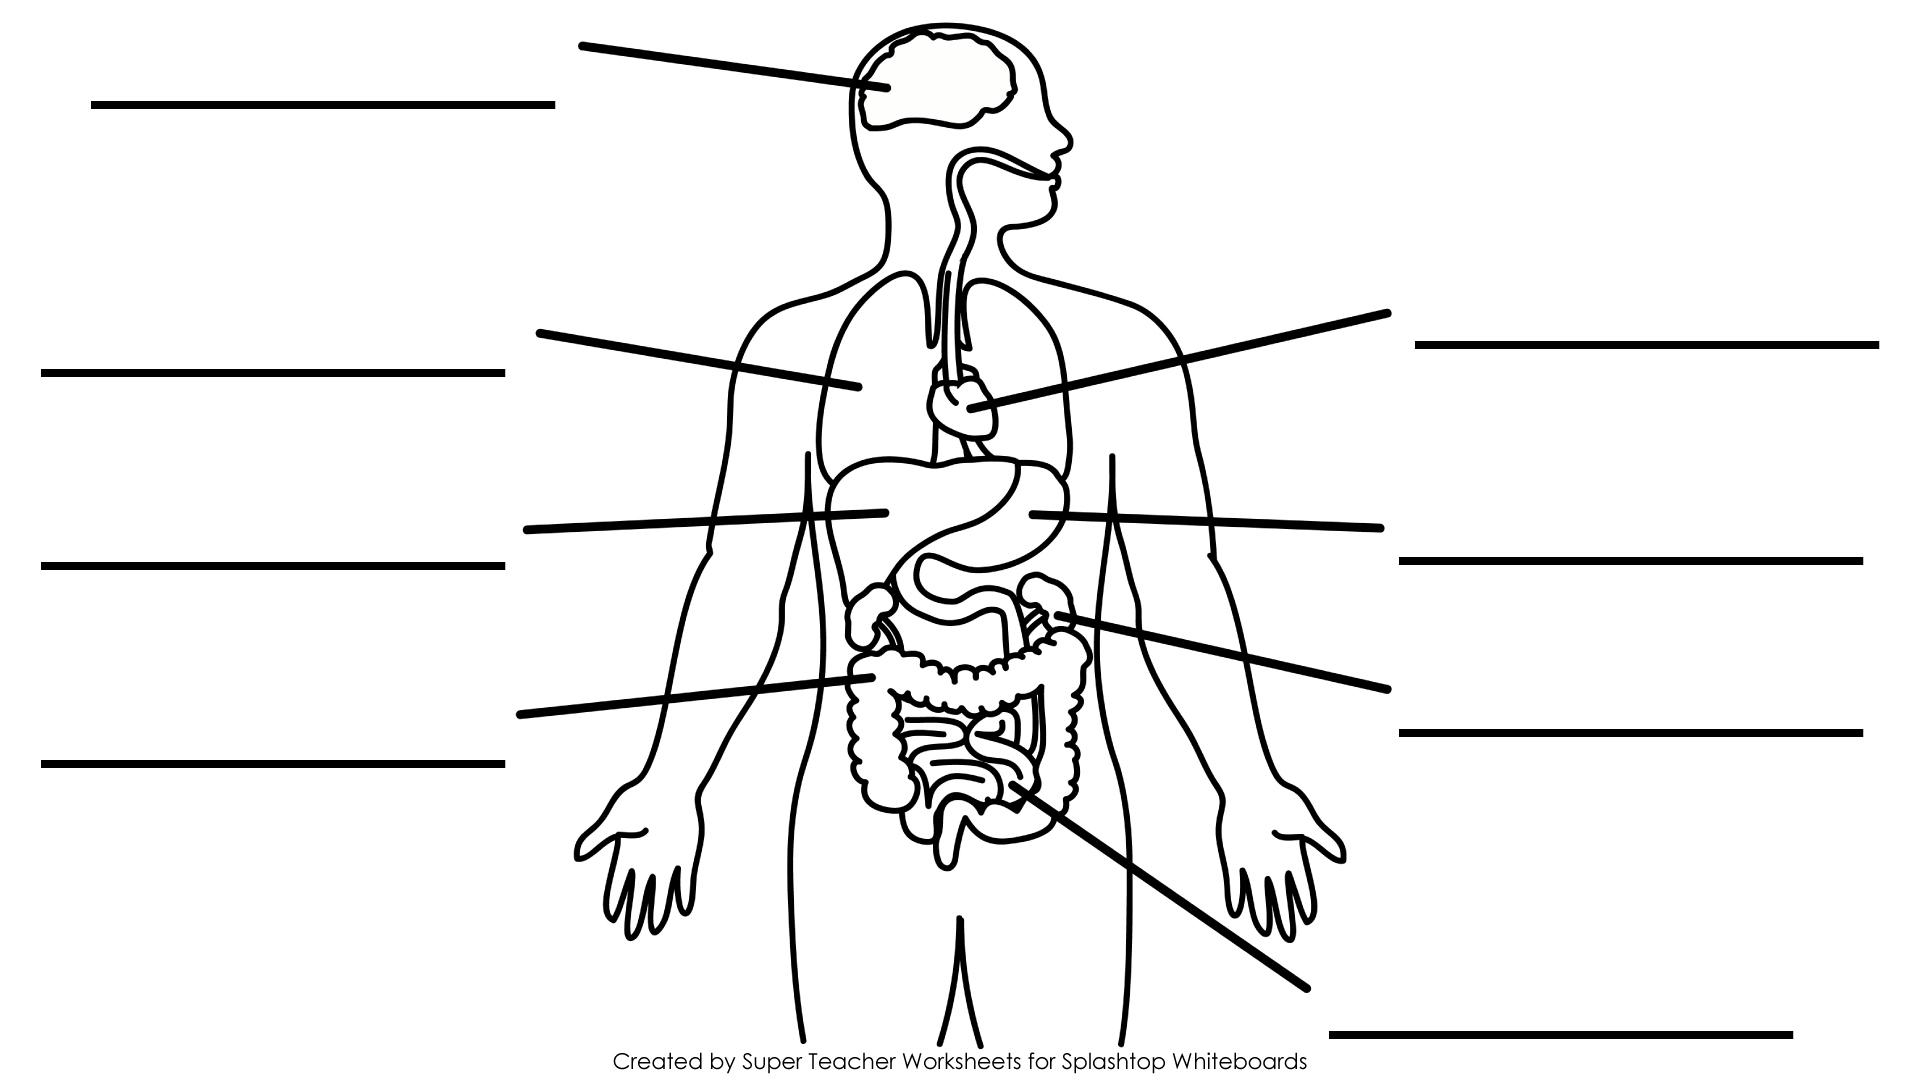 the human skeleton diagram fill in blanks wiring for fender strat 5 way switch free printable blank brain download clip art on splashtop whiteboard background graphics